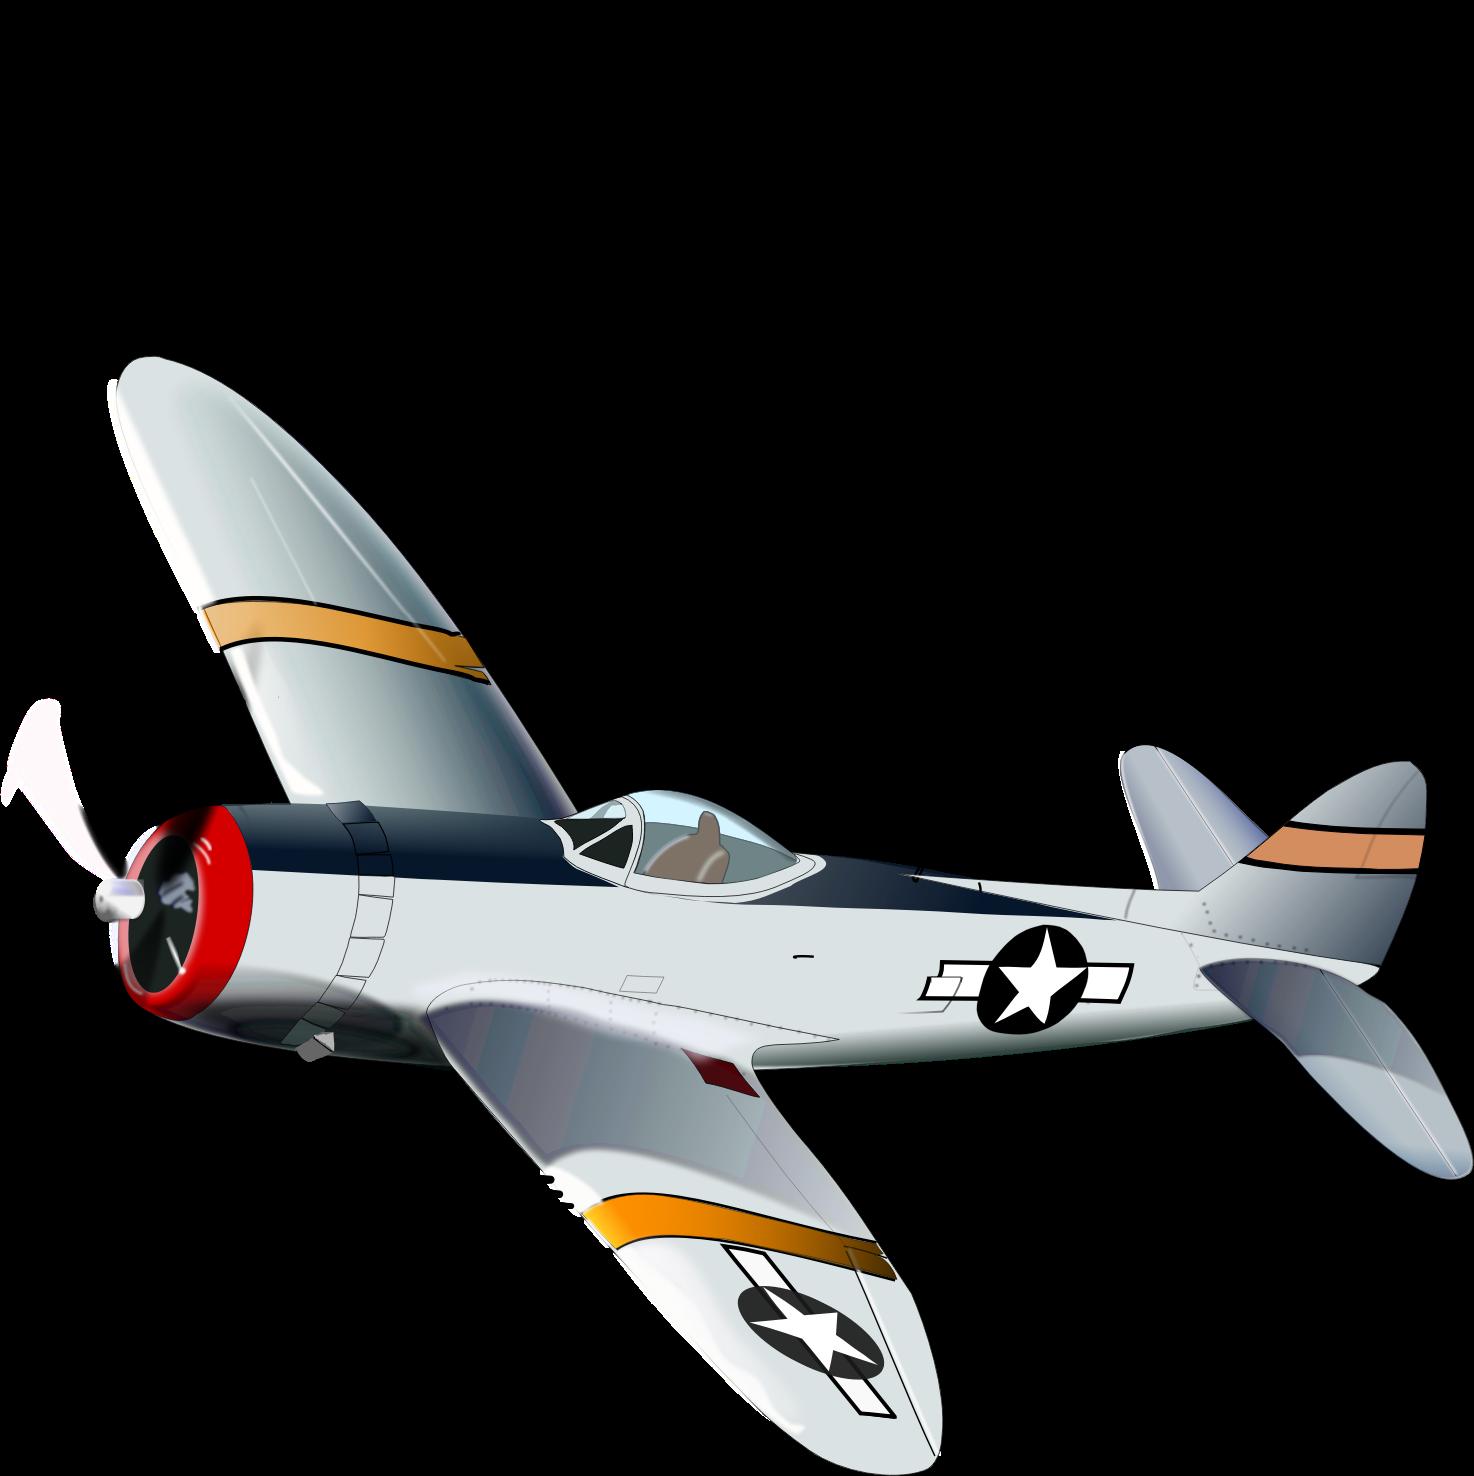 Jet Fighter clipart ww2 plane #11